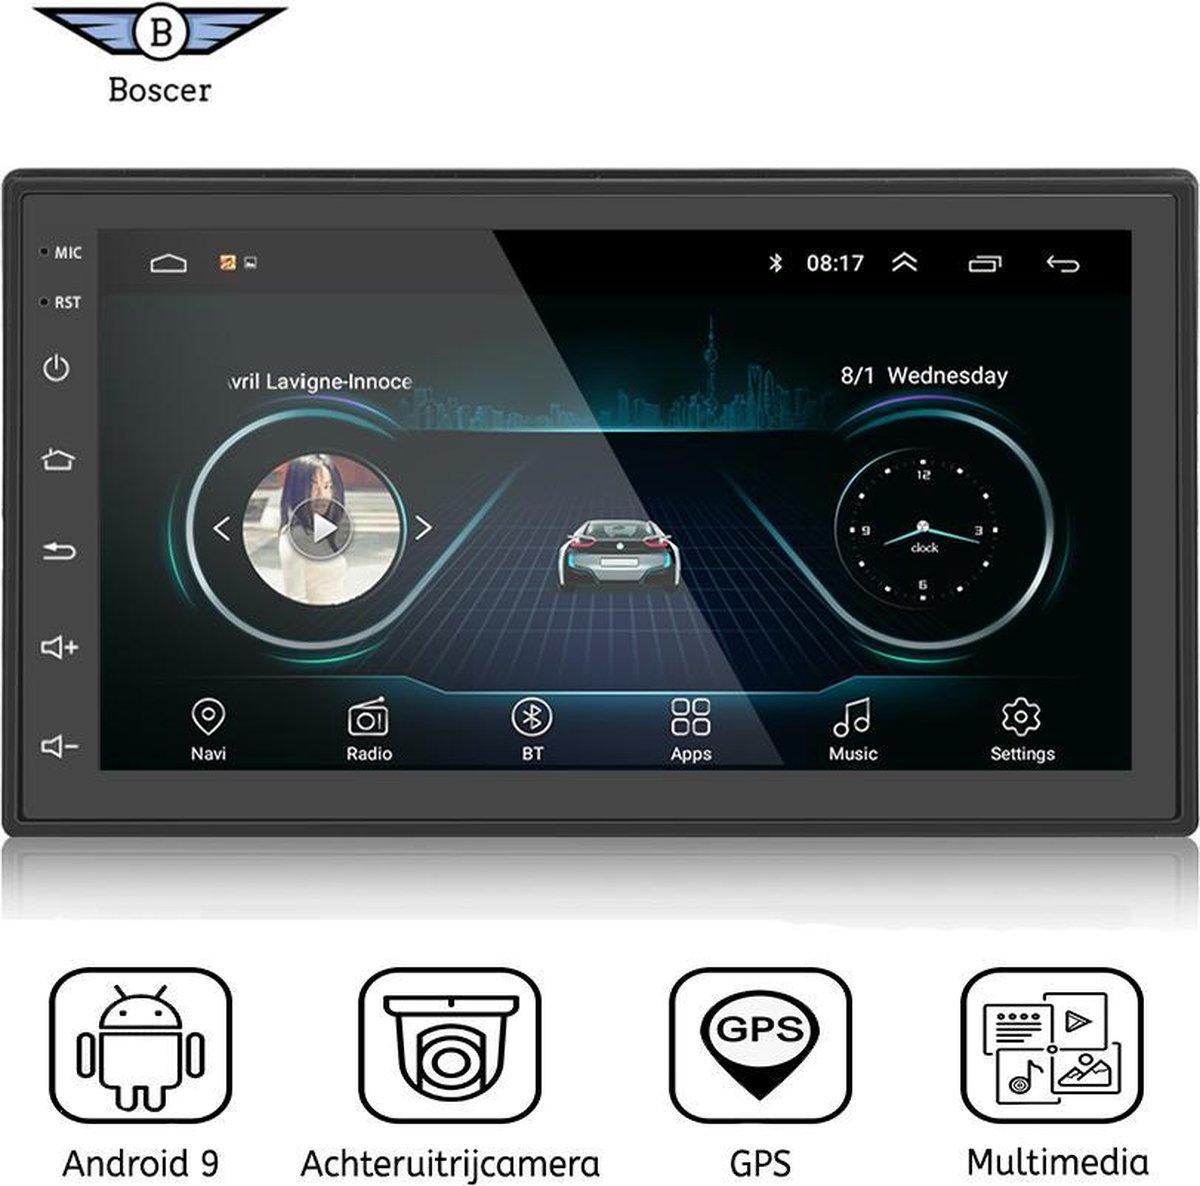 Boscer® Autoradio   Android 9.1   2 Din universeel   Navigatiesysteem   7' HD scherm   Achteruitrijcamera